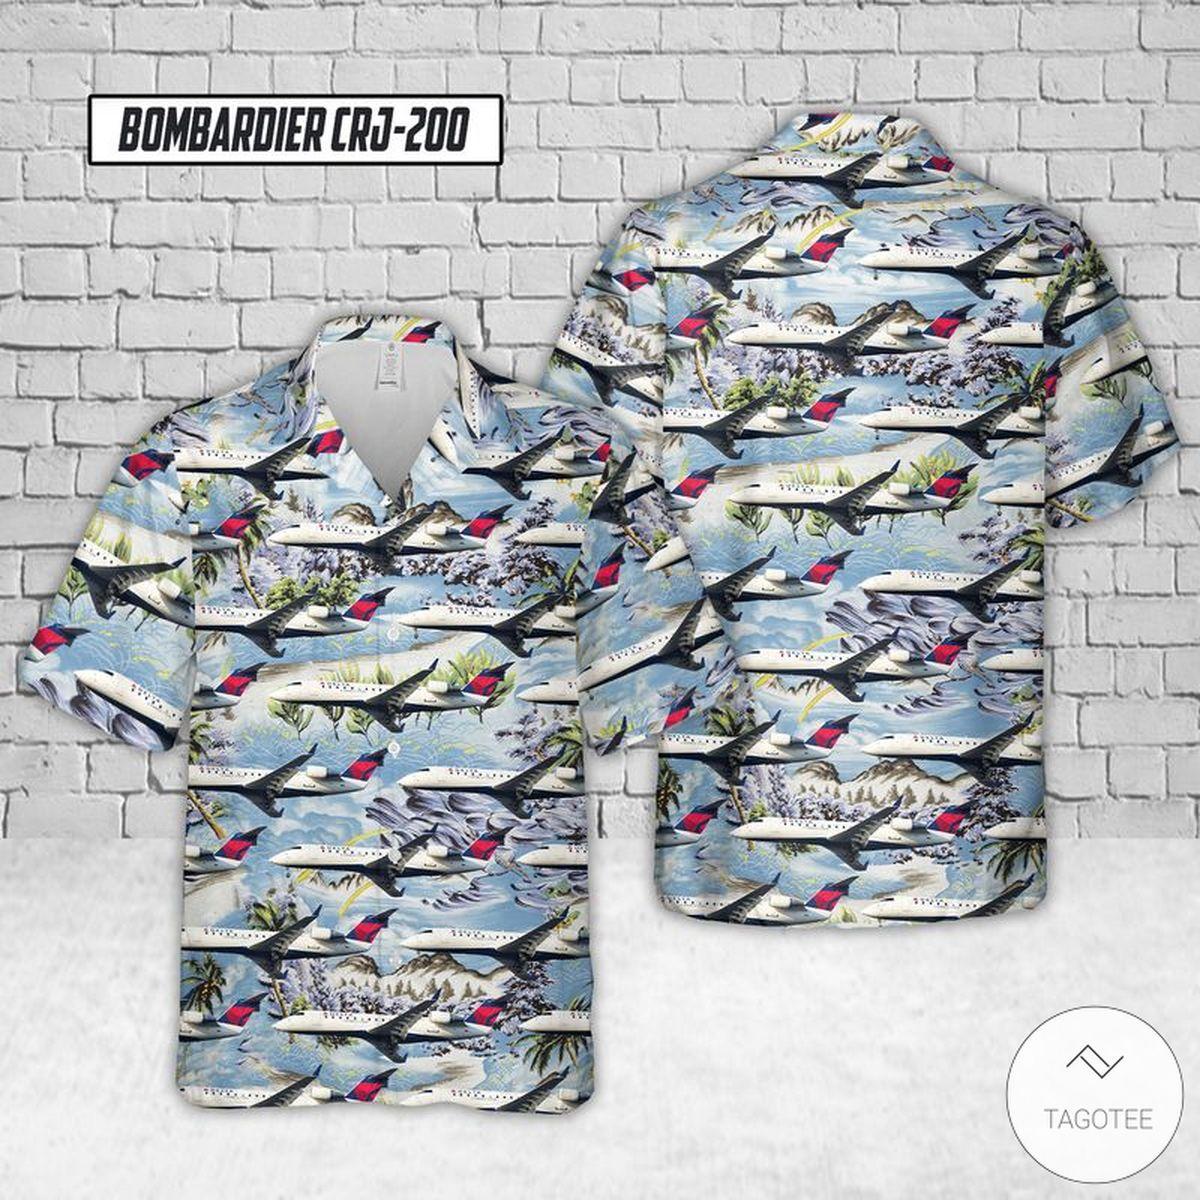 Endeavor Air Bombardier CRJ-200 Hawaiian Shirt